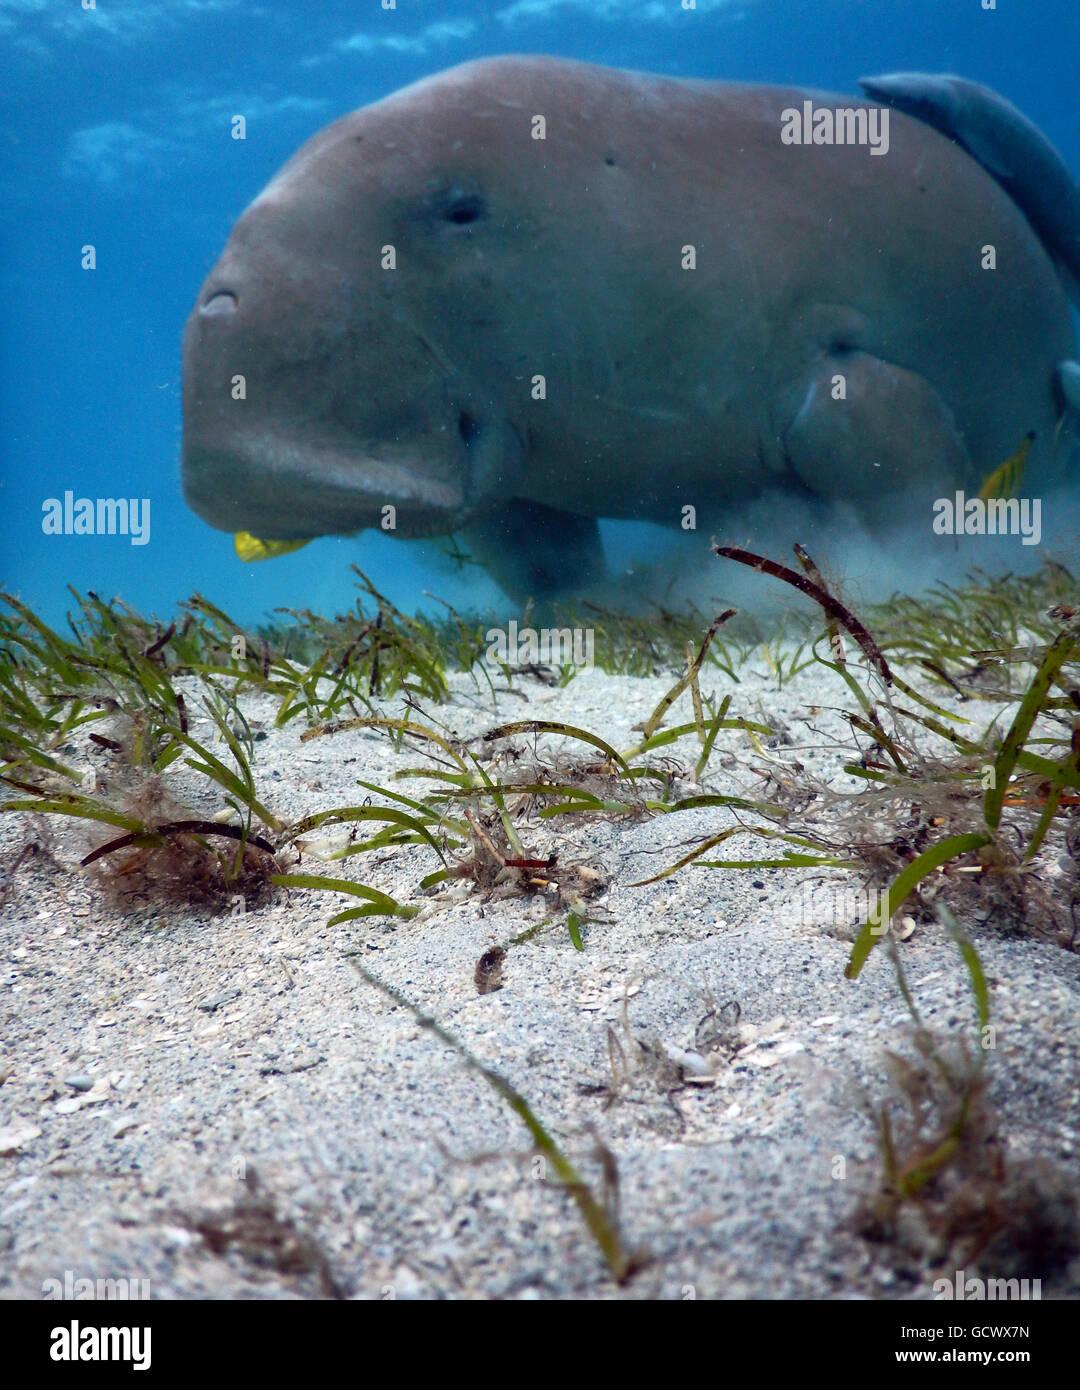 La vida subacuática Marsa Mubarak Foto de stock